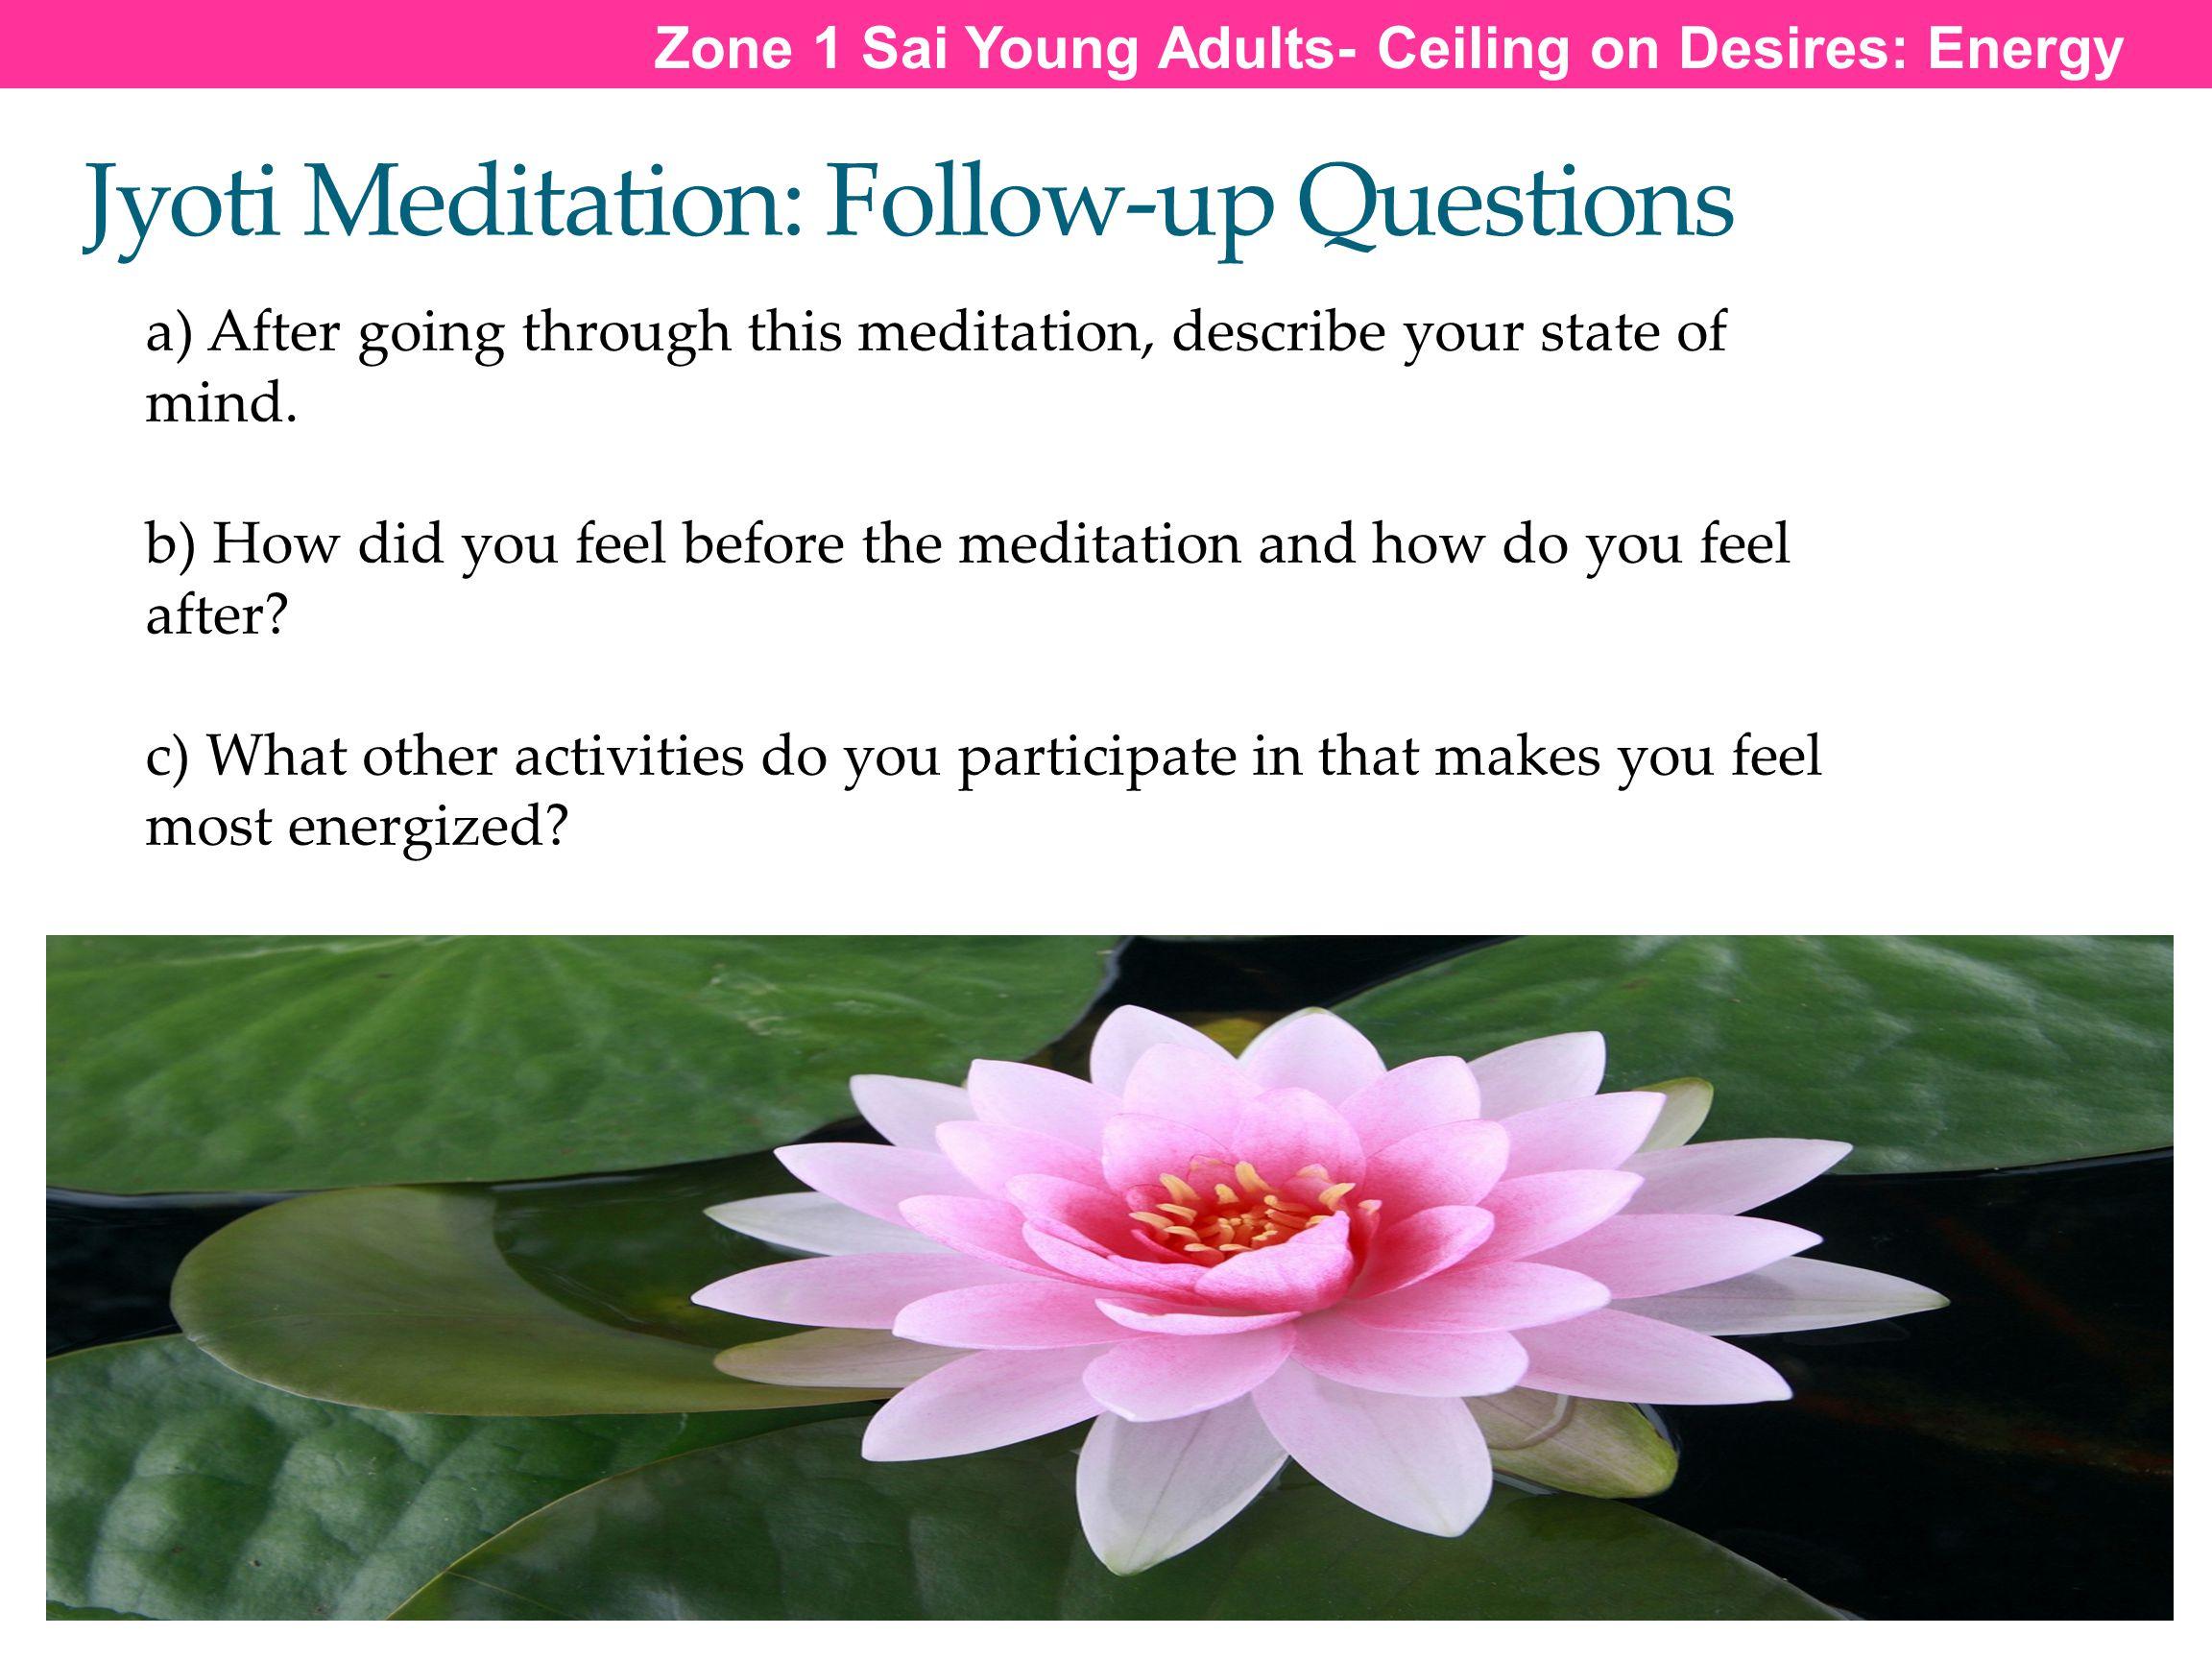 Jyoti Meditation: Follow-up Questions